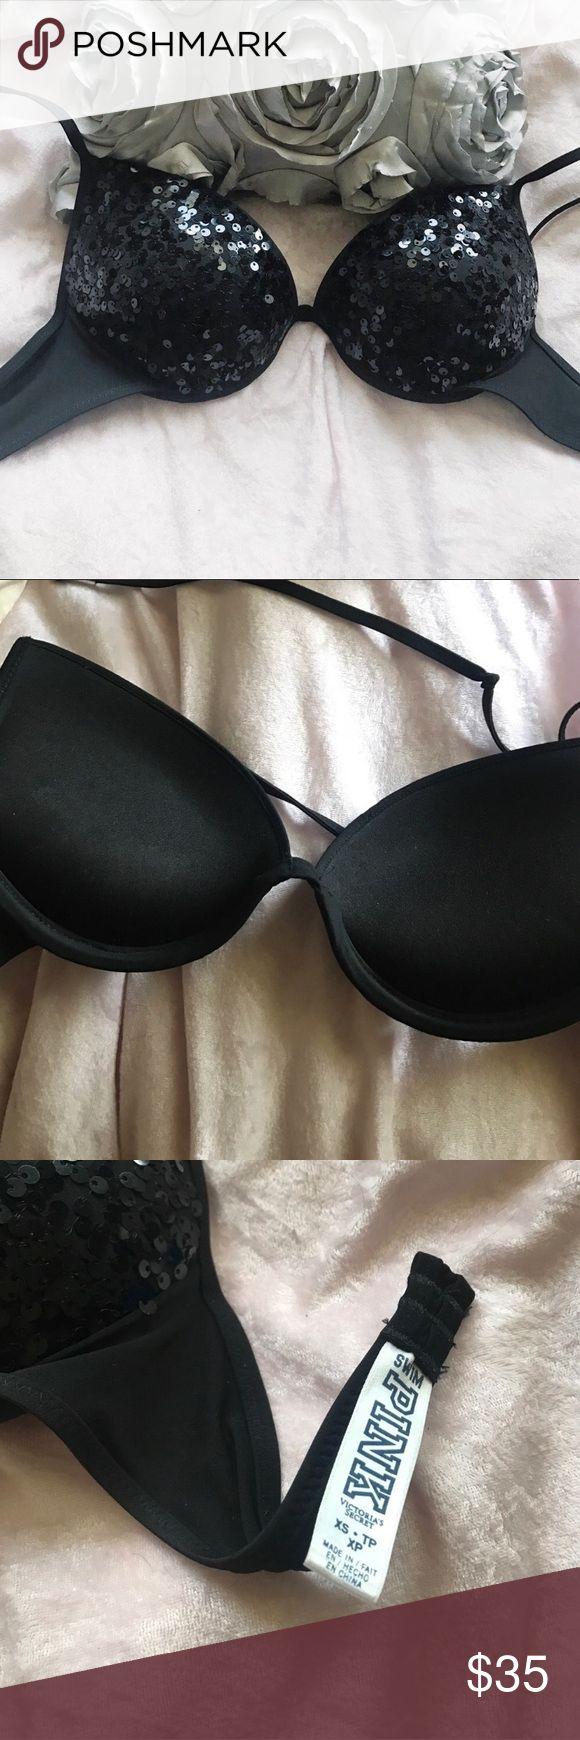 Victoria Secret push-up bikini top Black with sequins. Worn once. Size XS. fits an A/B cup. PINK Victoria's Secret Swim Bikinis